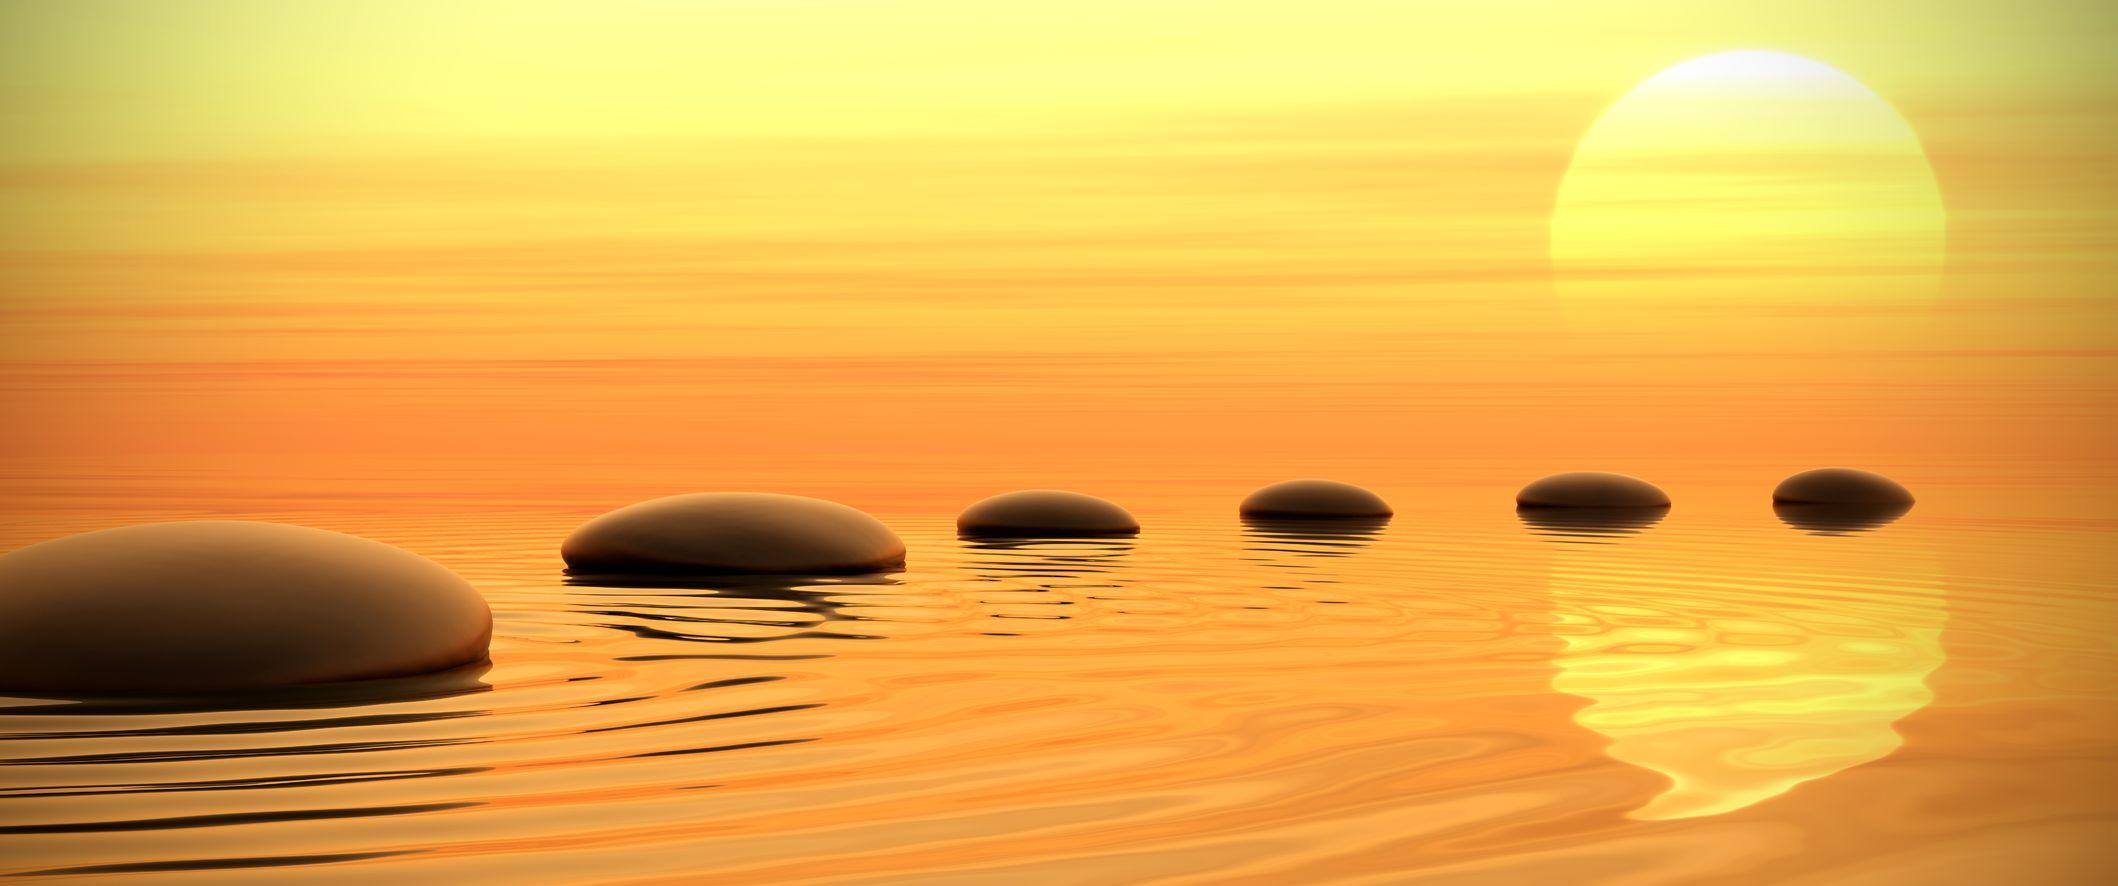 Mindful Yoga & Meditation 101 with Amy Jo Metzendorf of Bodhi Tree Yoga